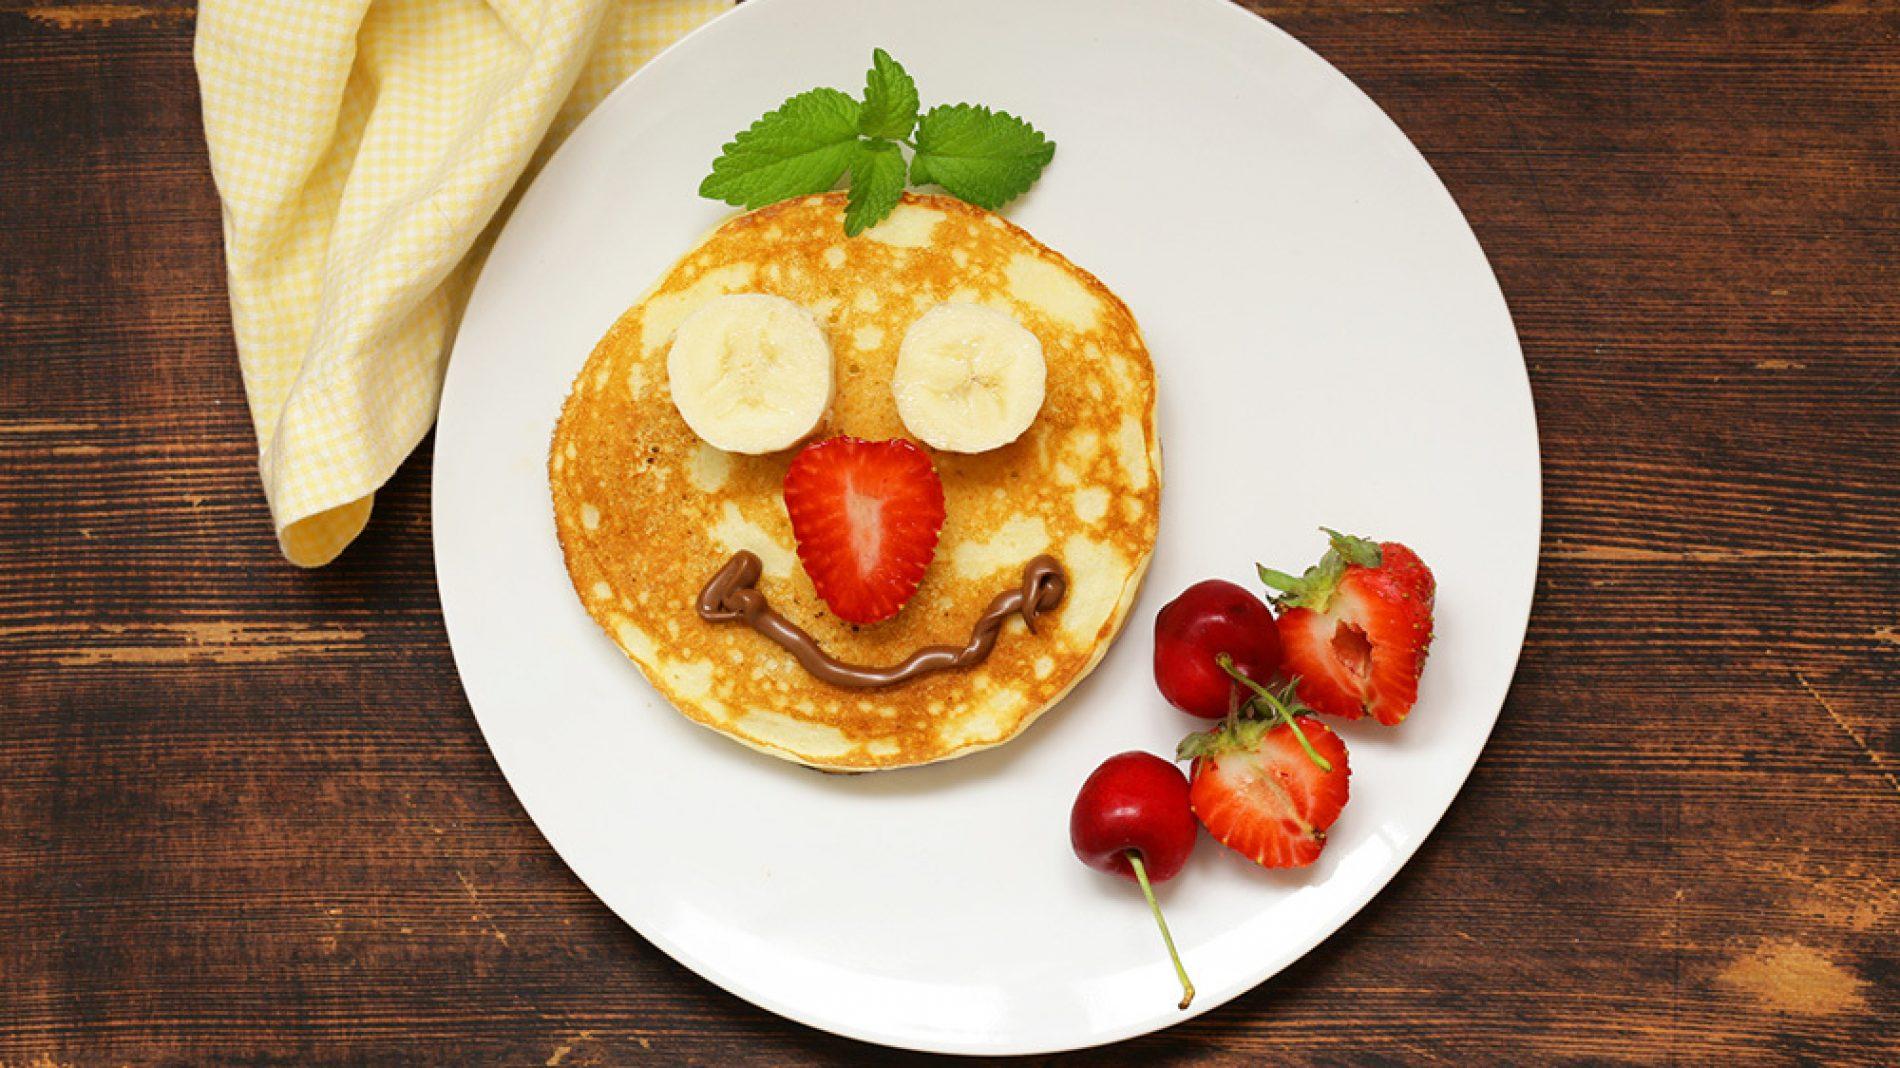 A lovely smiling pancake